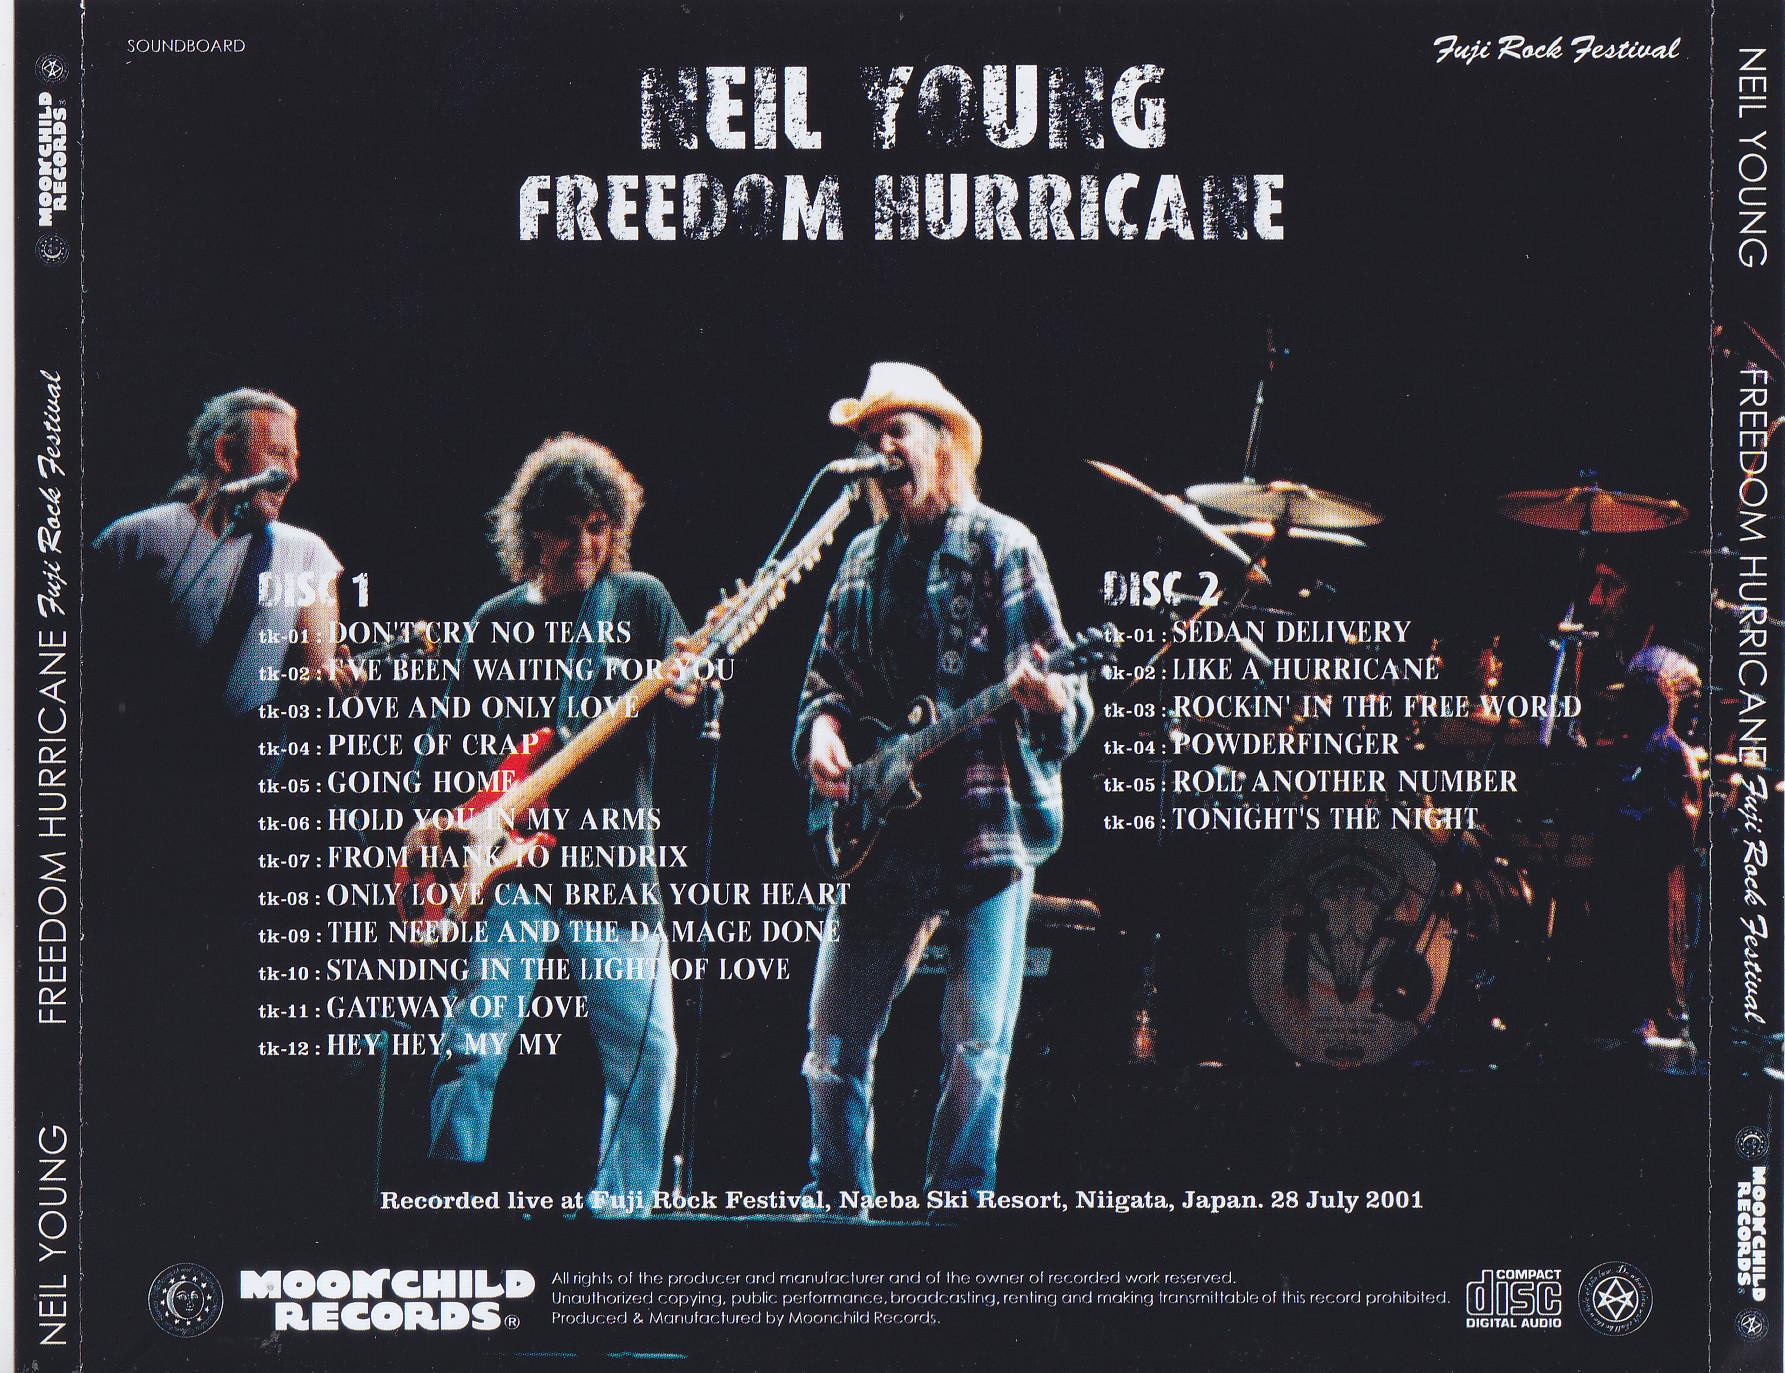 Neil Young / Freedom Hurricane Fuji Rock Festival / 2CD